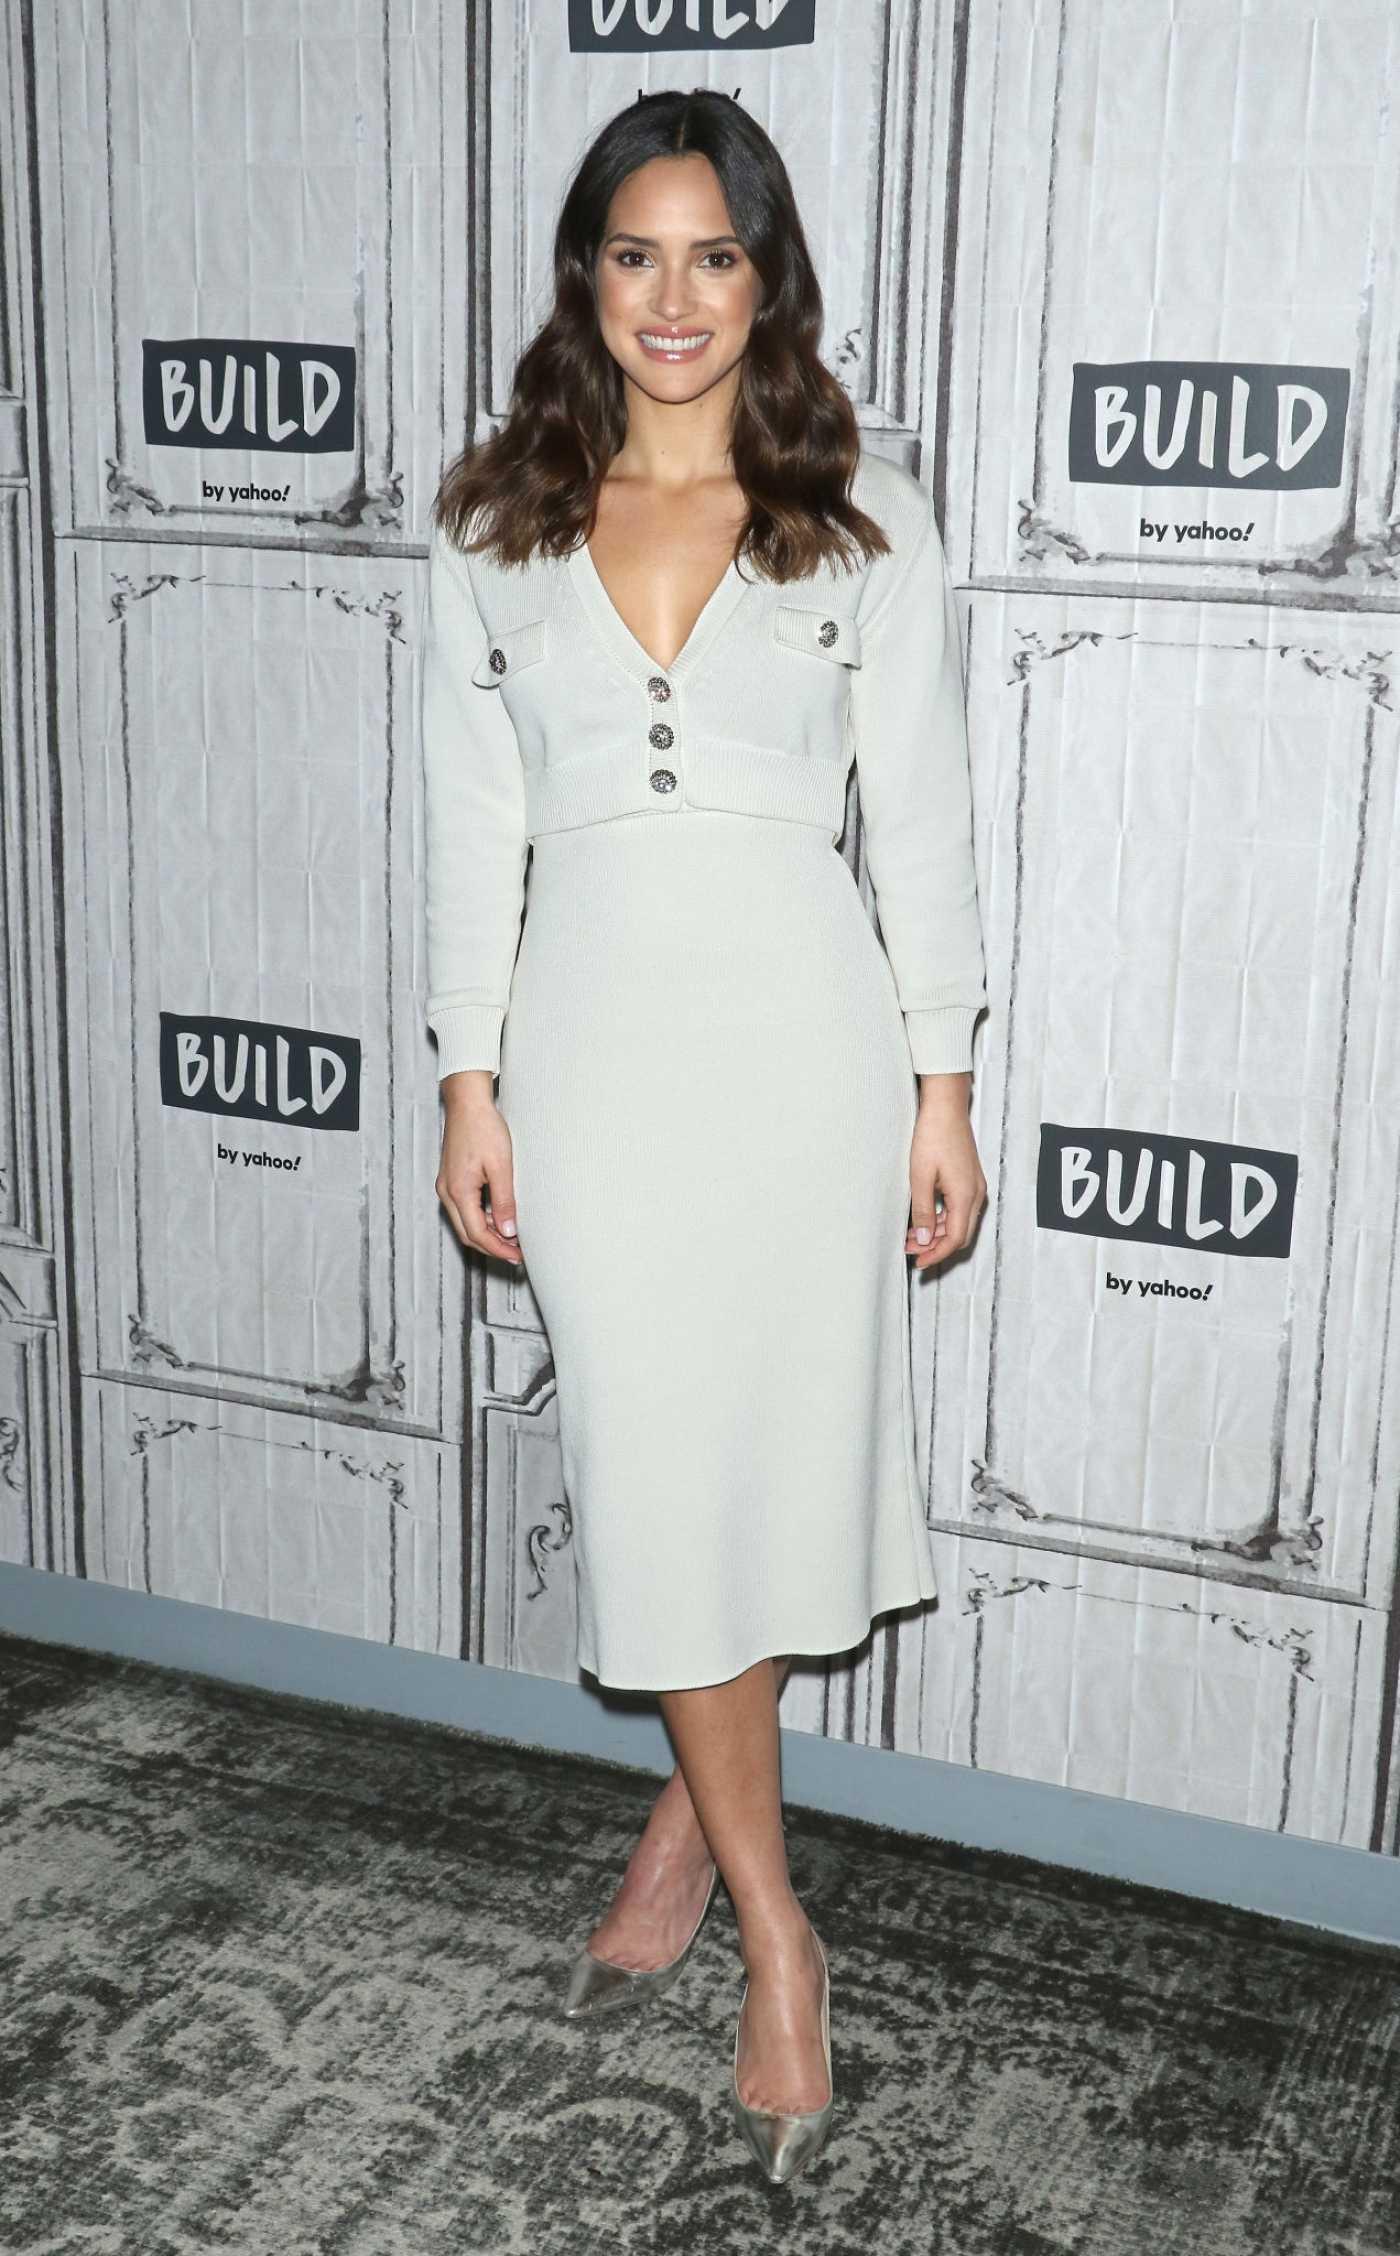 Adria Arjona Attends the Build Series in New York City 12/11/2019